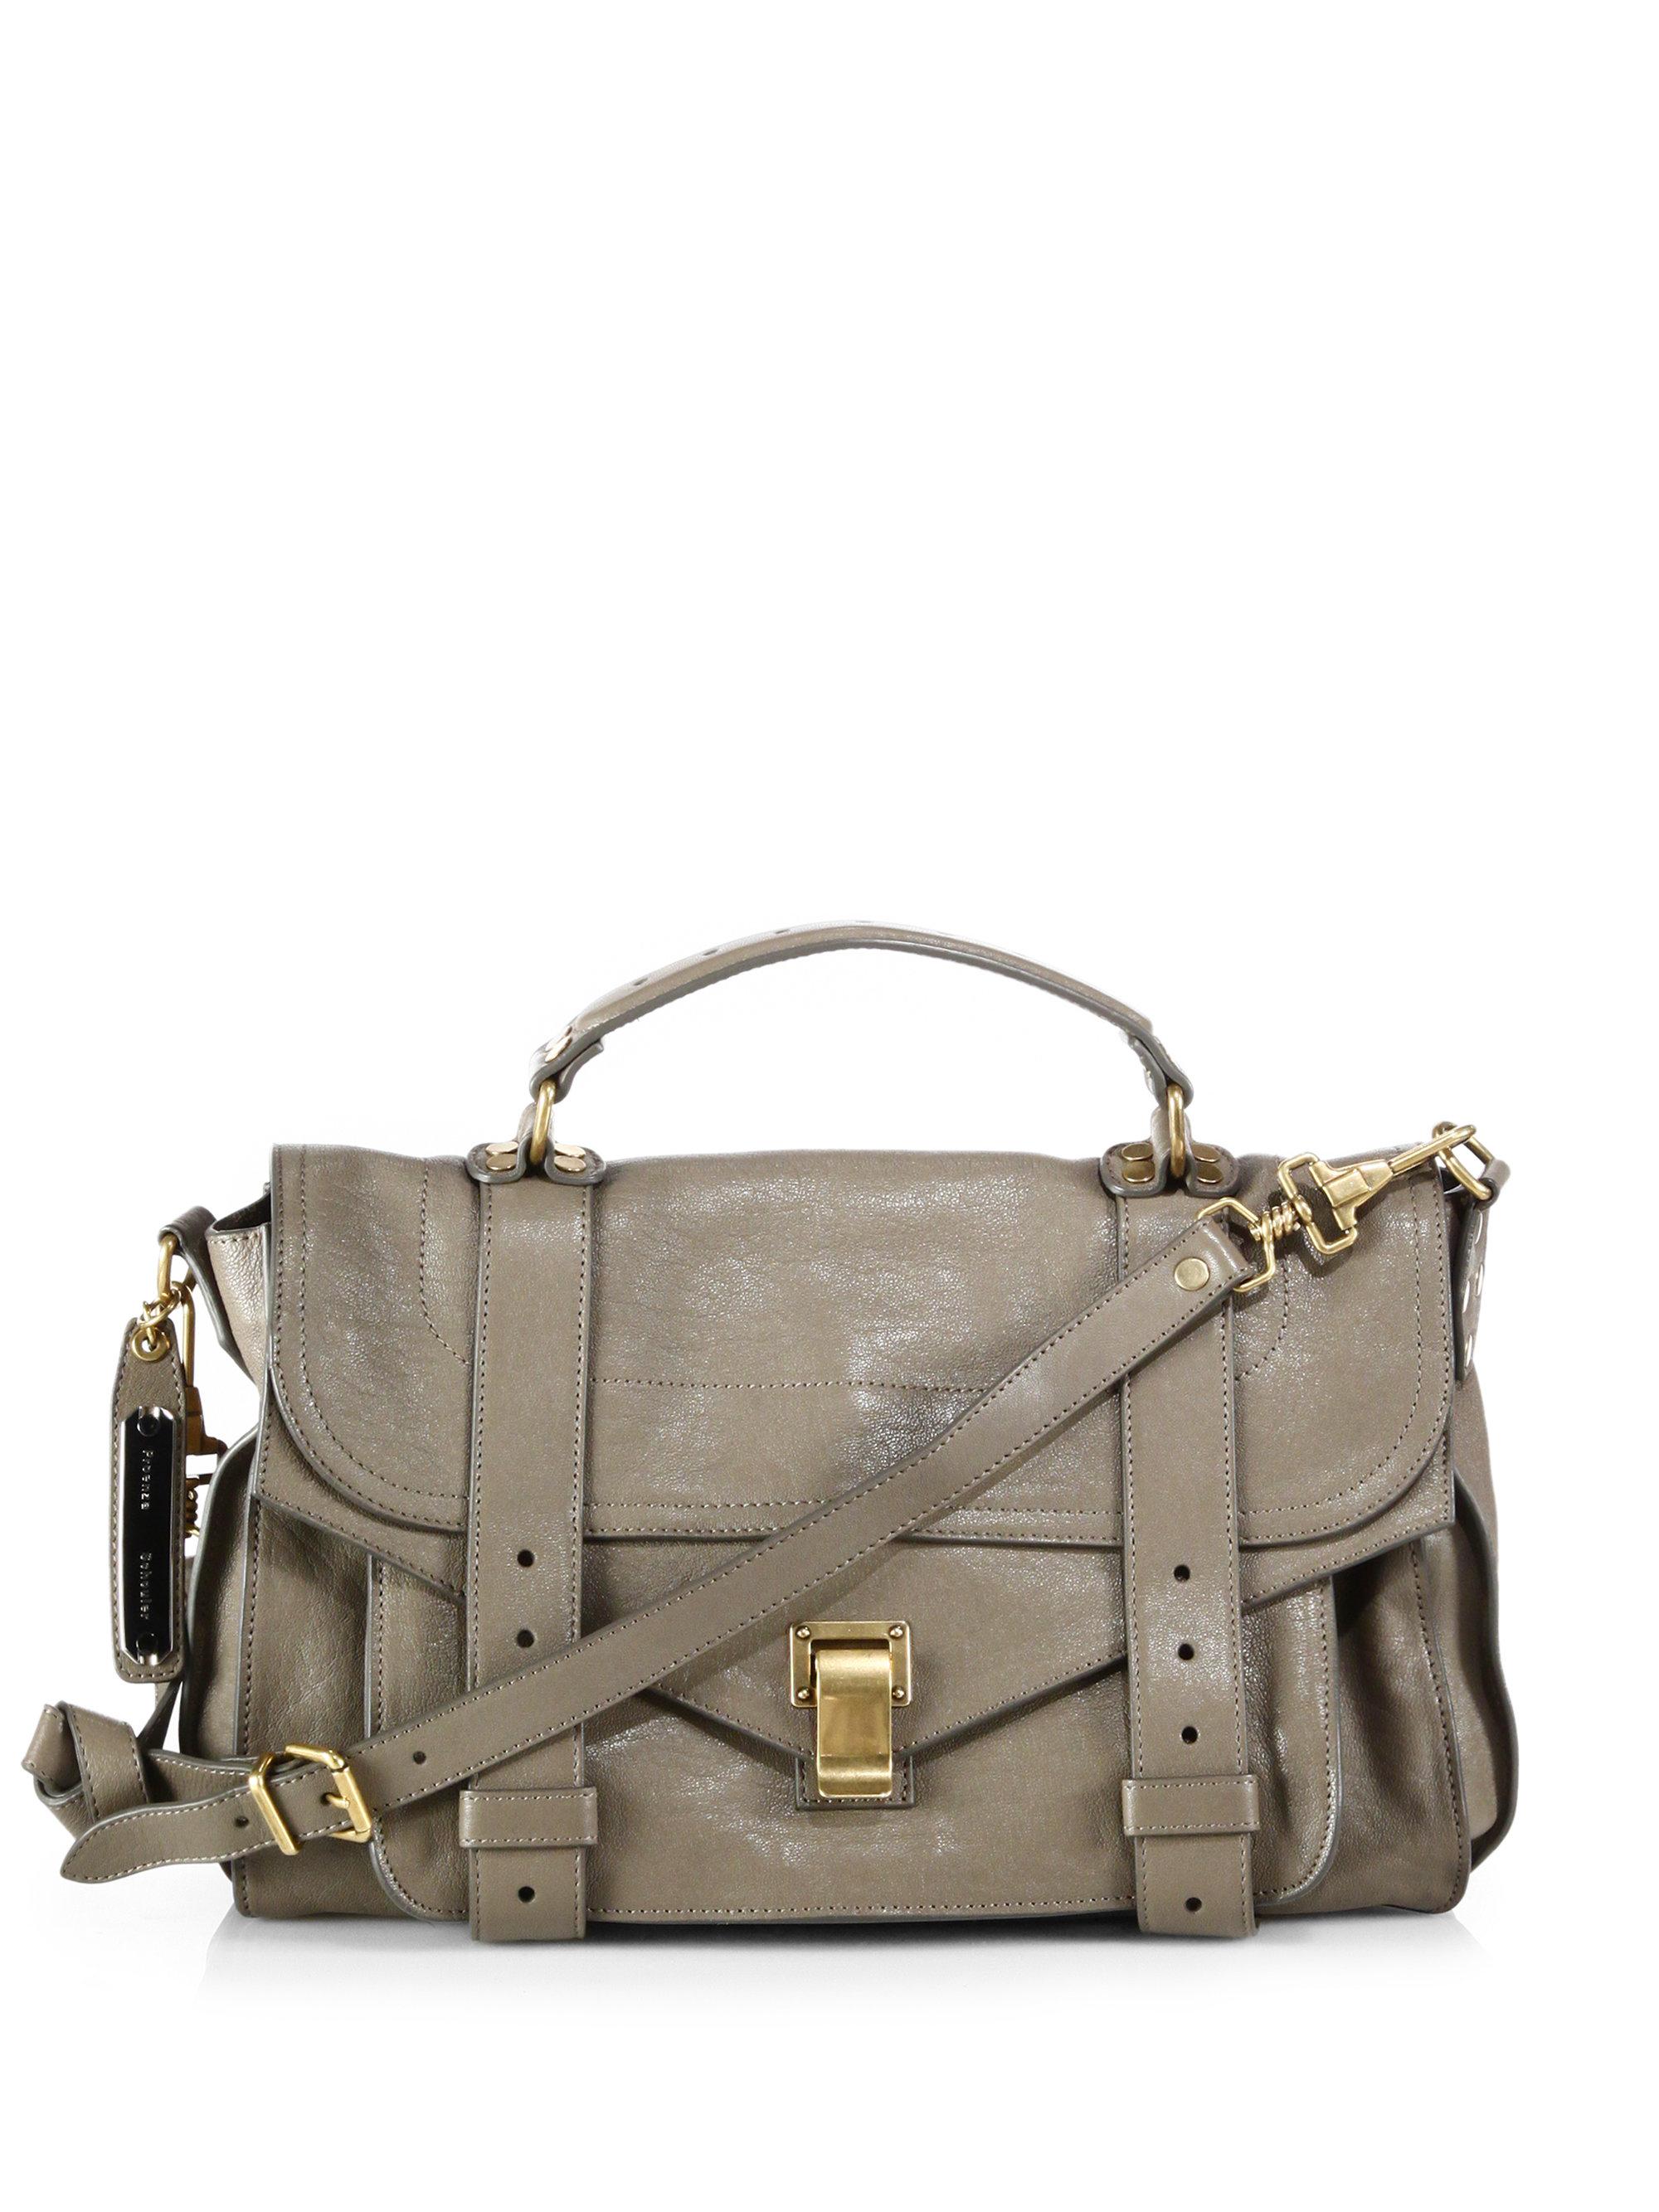 Proenza Schouler Women's Bags, Dresses & Shoes   Nordstrom